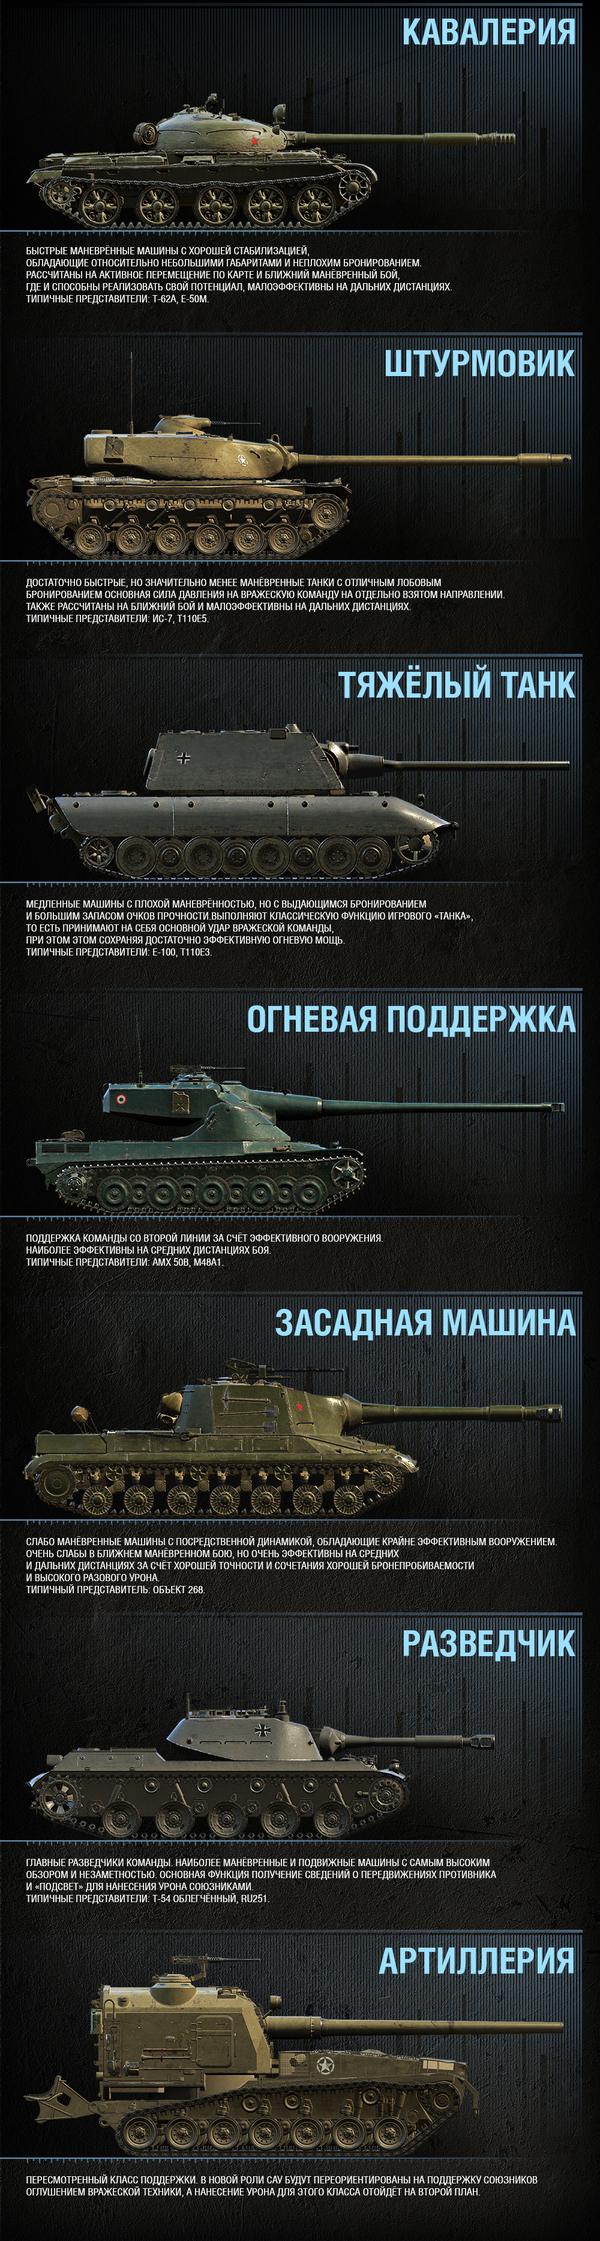 World of Tanks начали тестирование нового игрового баланса 2.0 World of Tanks, Esport, Киберспорт, Новости, Длиннопост